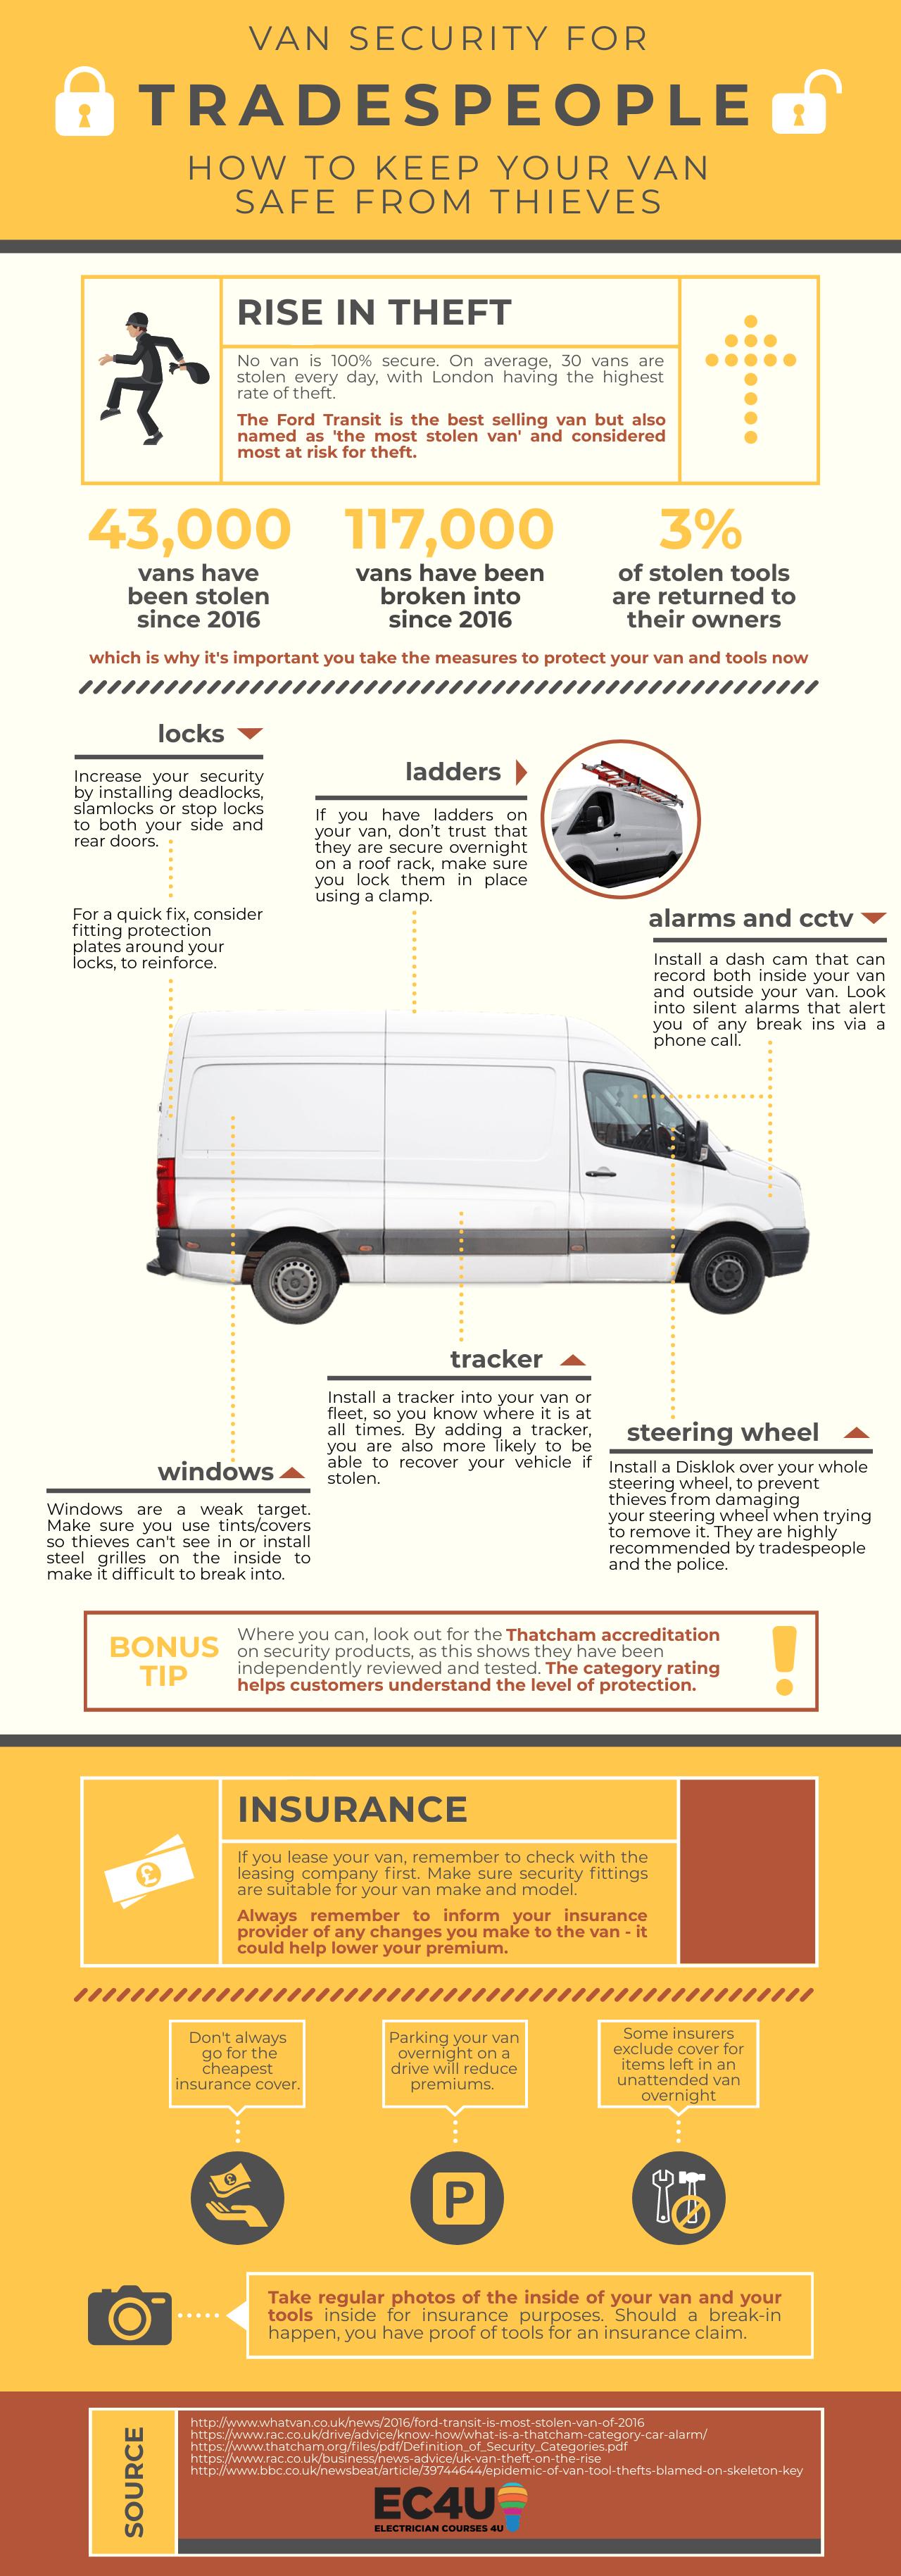 van security for tradespeople 2020